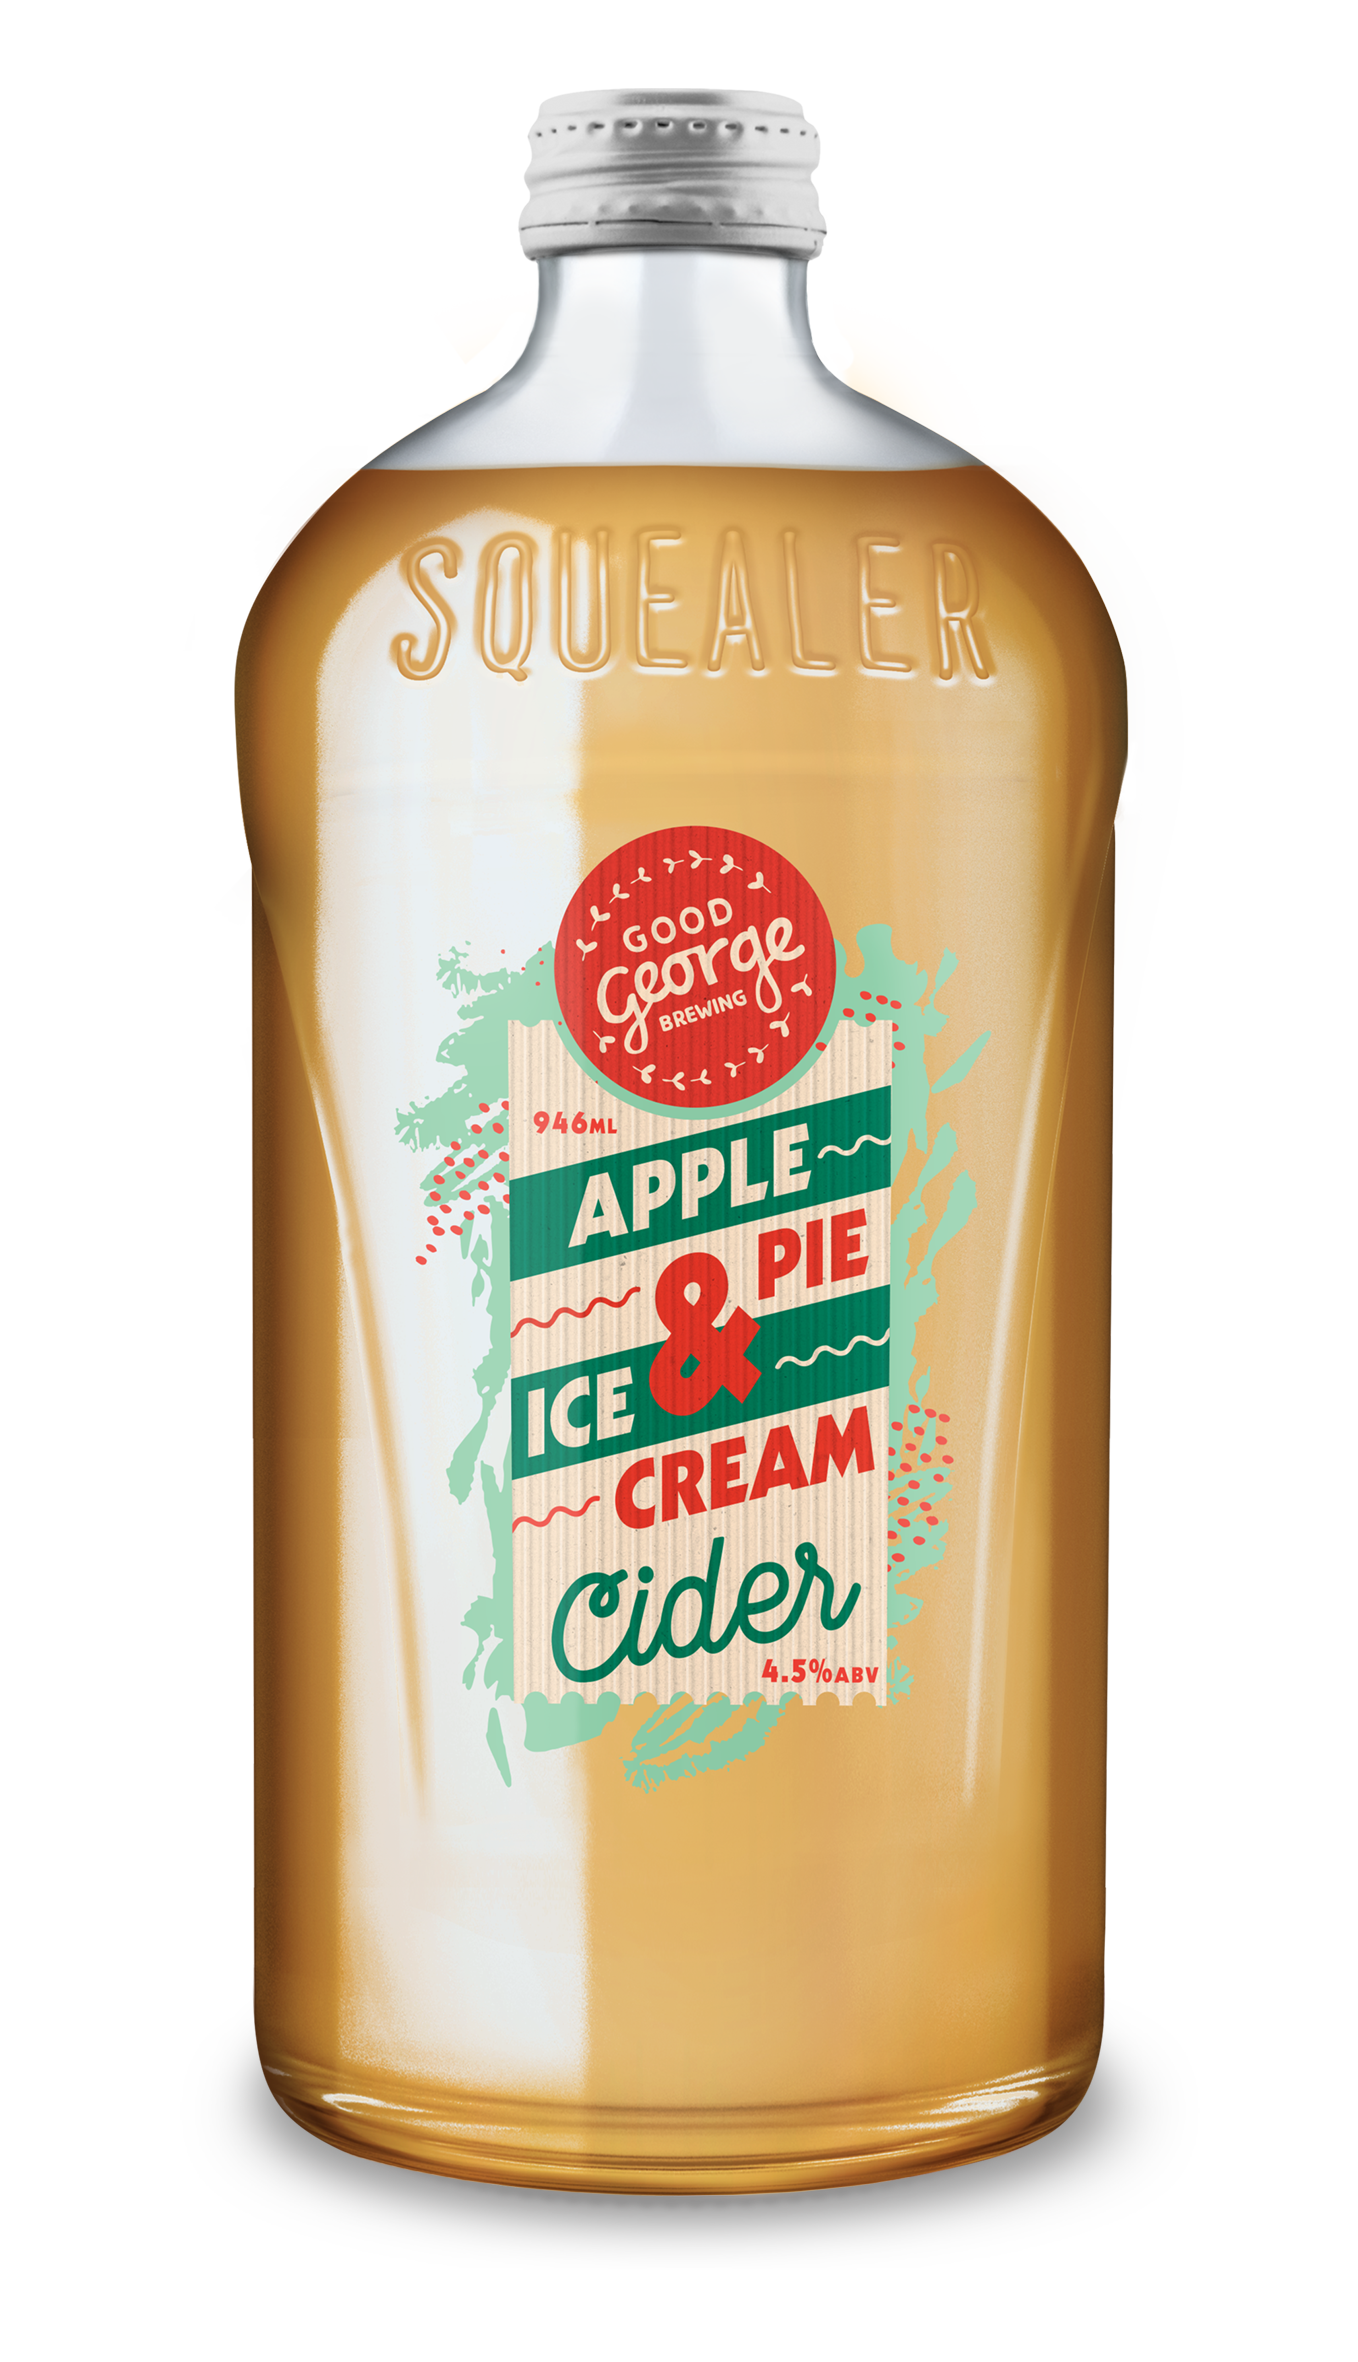 Good George Apple Pie and Ice Cream Cider Squealer